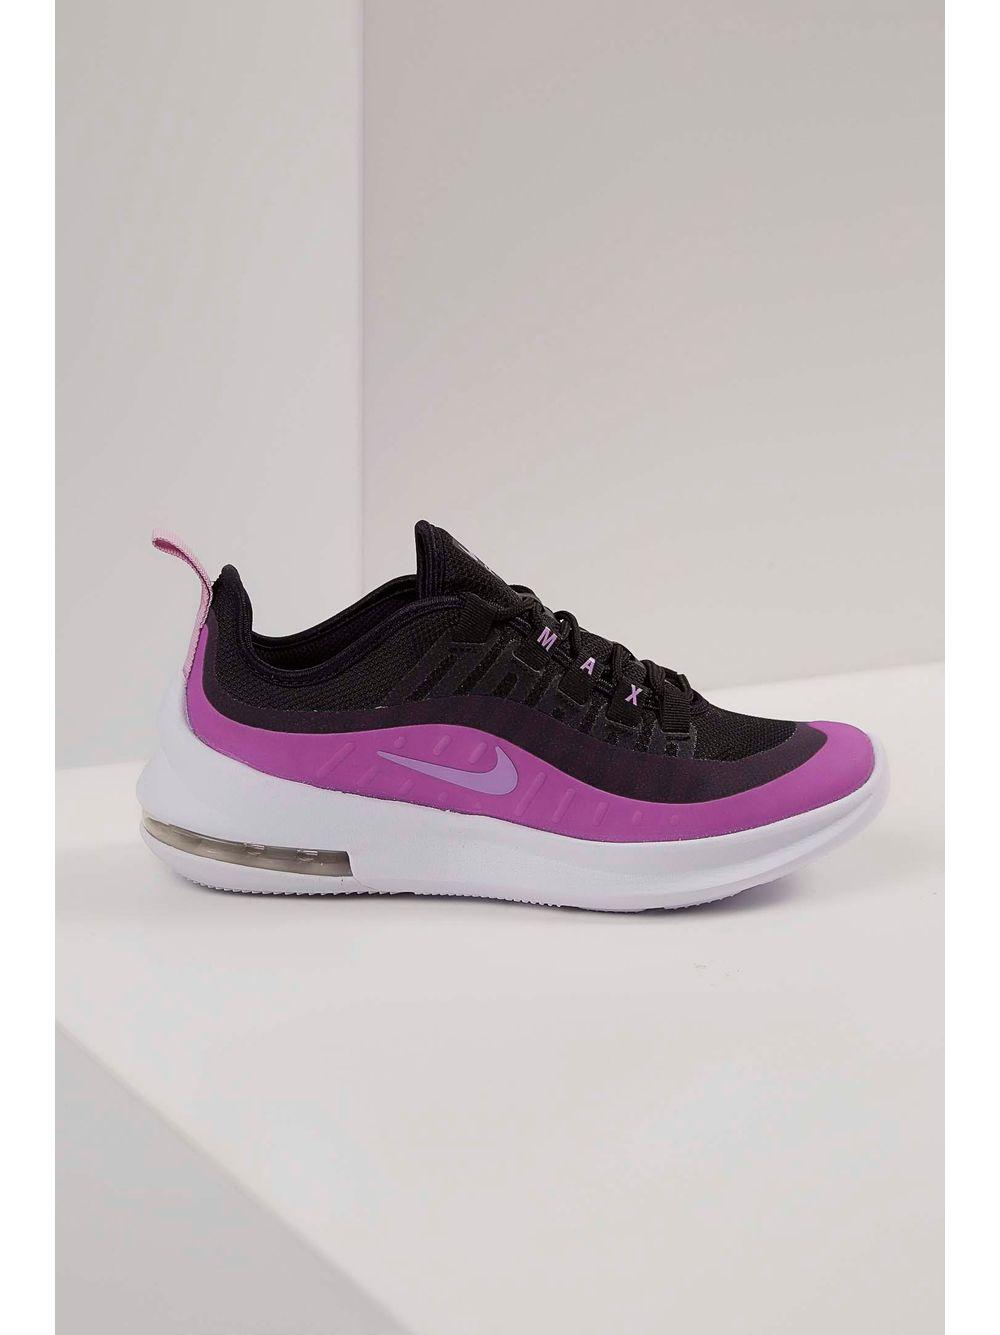 7ec7fdf0e63 Previous. Tenis-Nike-Air-Max-Axis-Infantil-Menina- ...